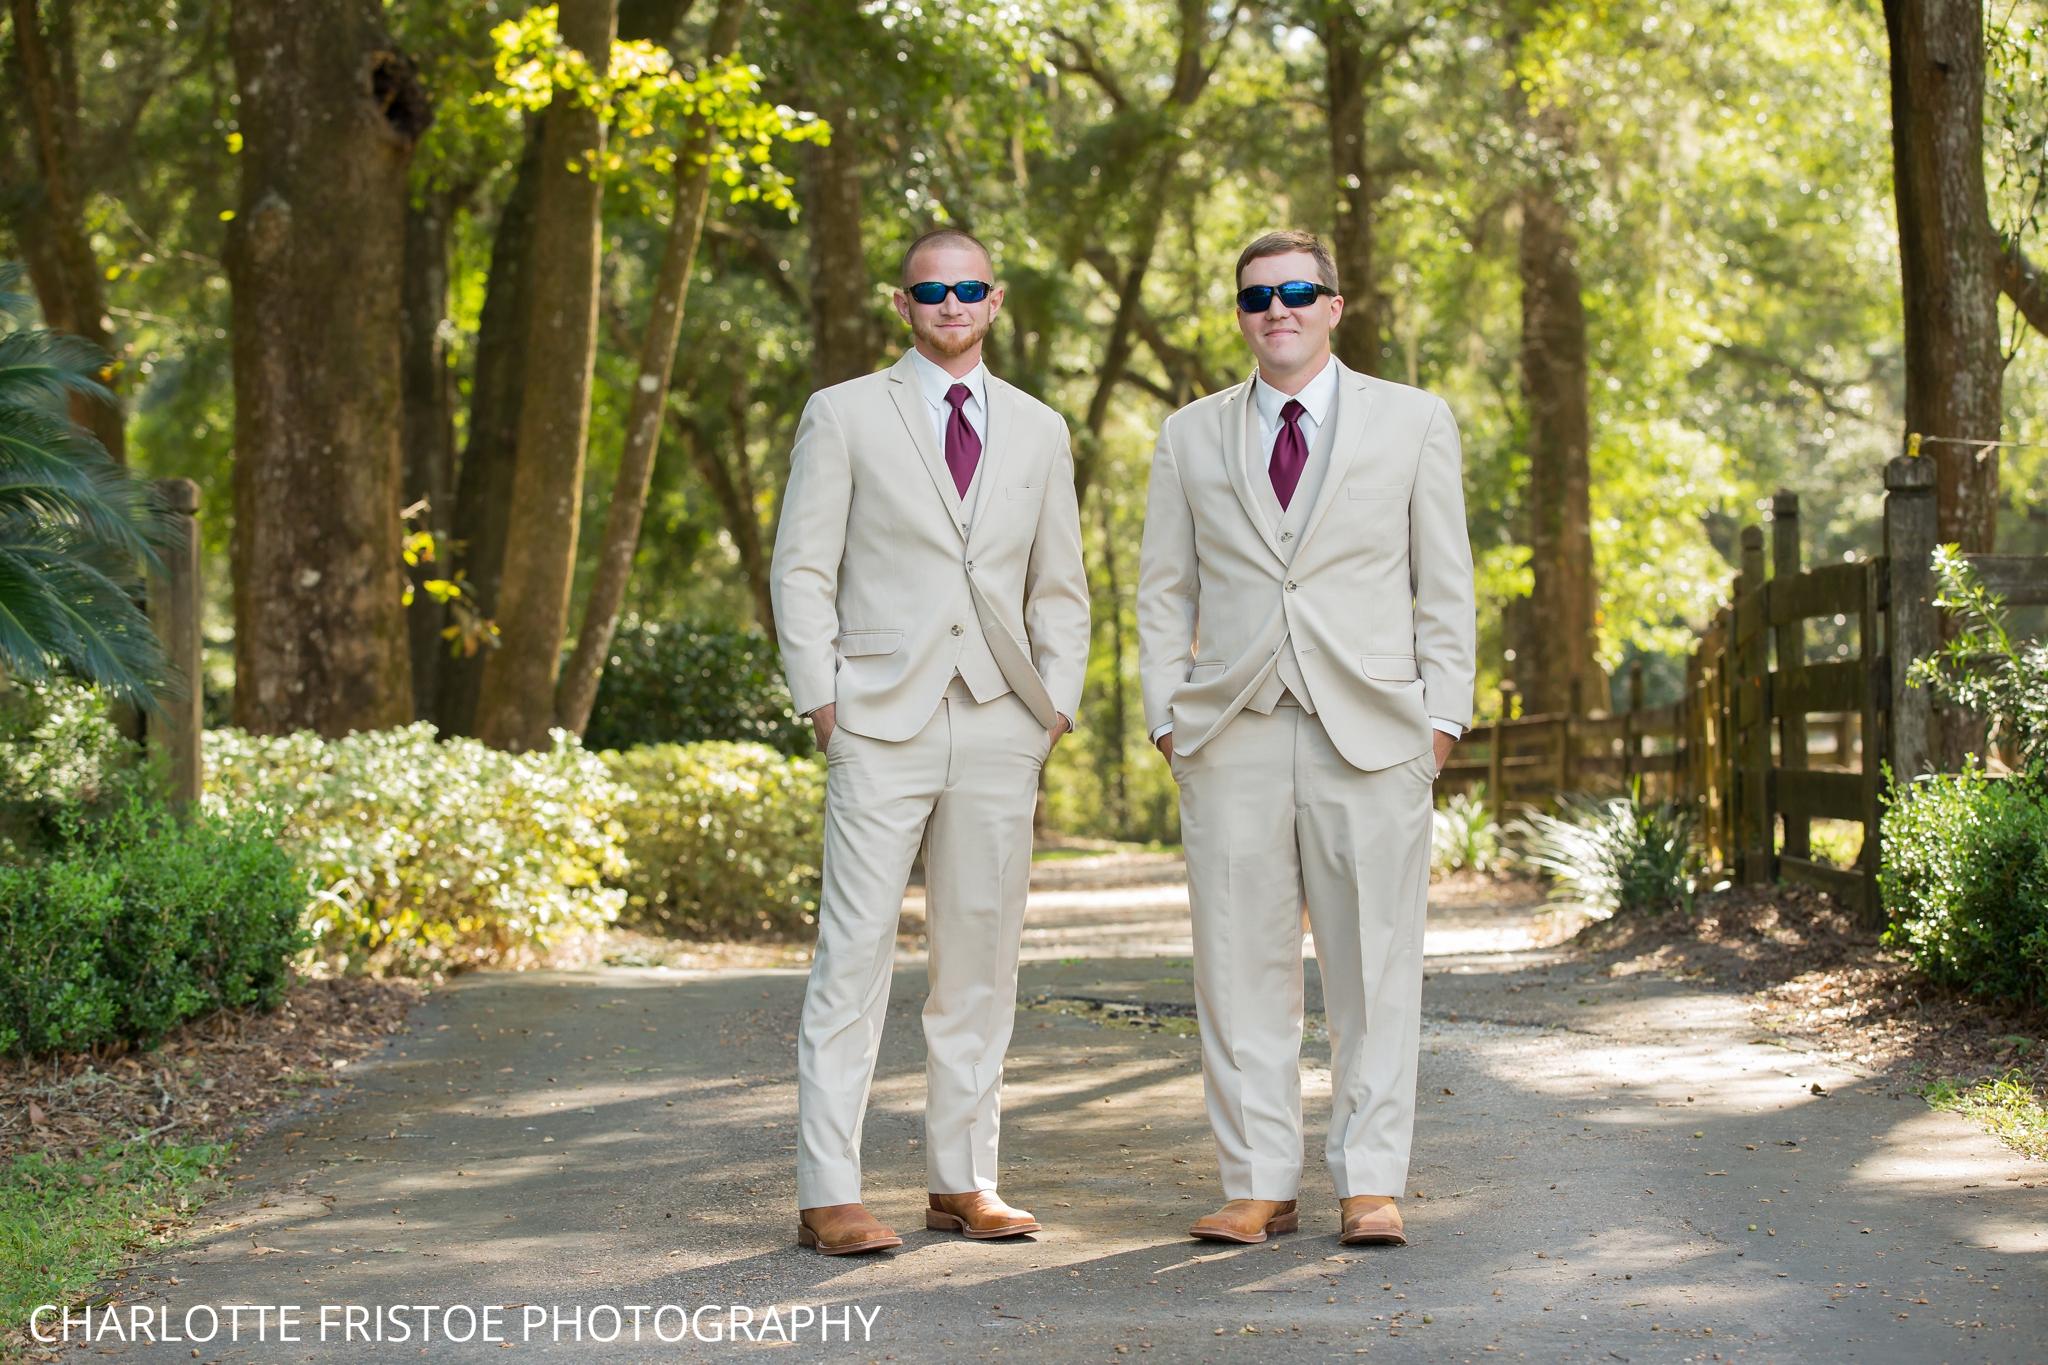 Tallahassee_Wedding_Charlotte_Fristoe-25.jpg